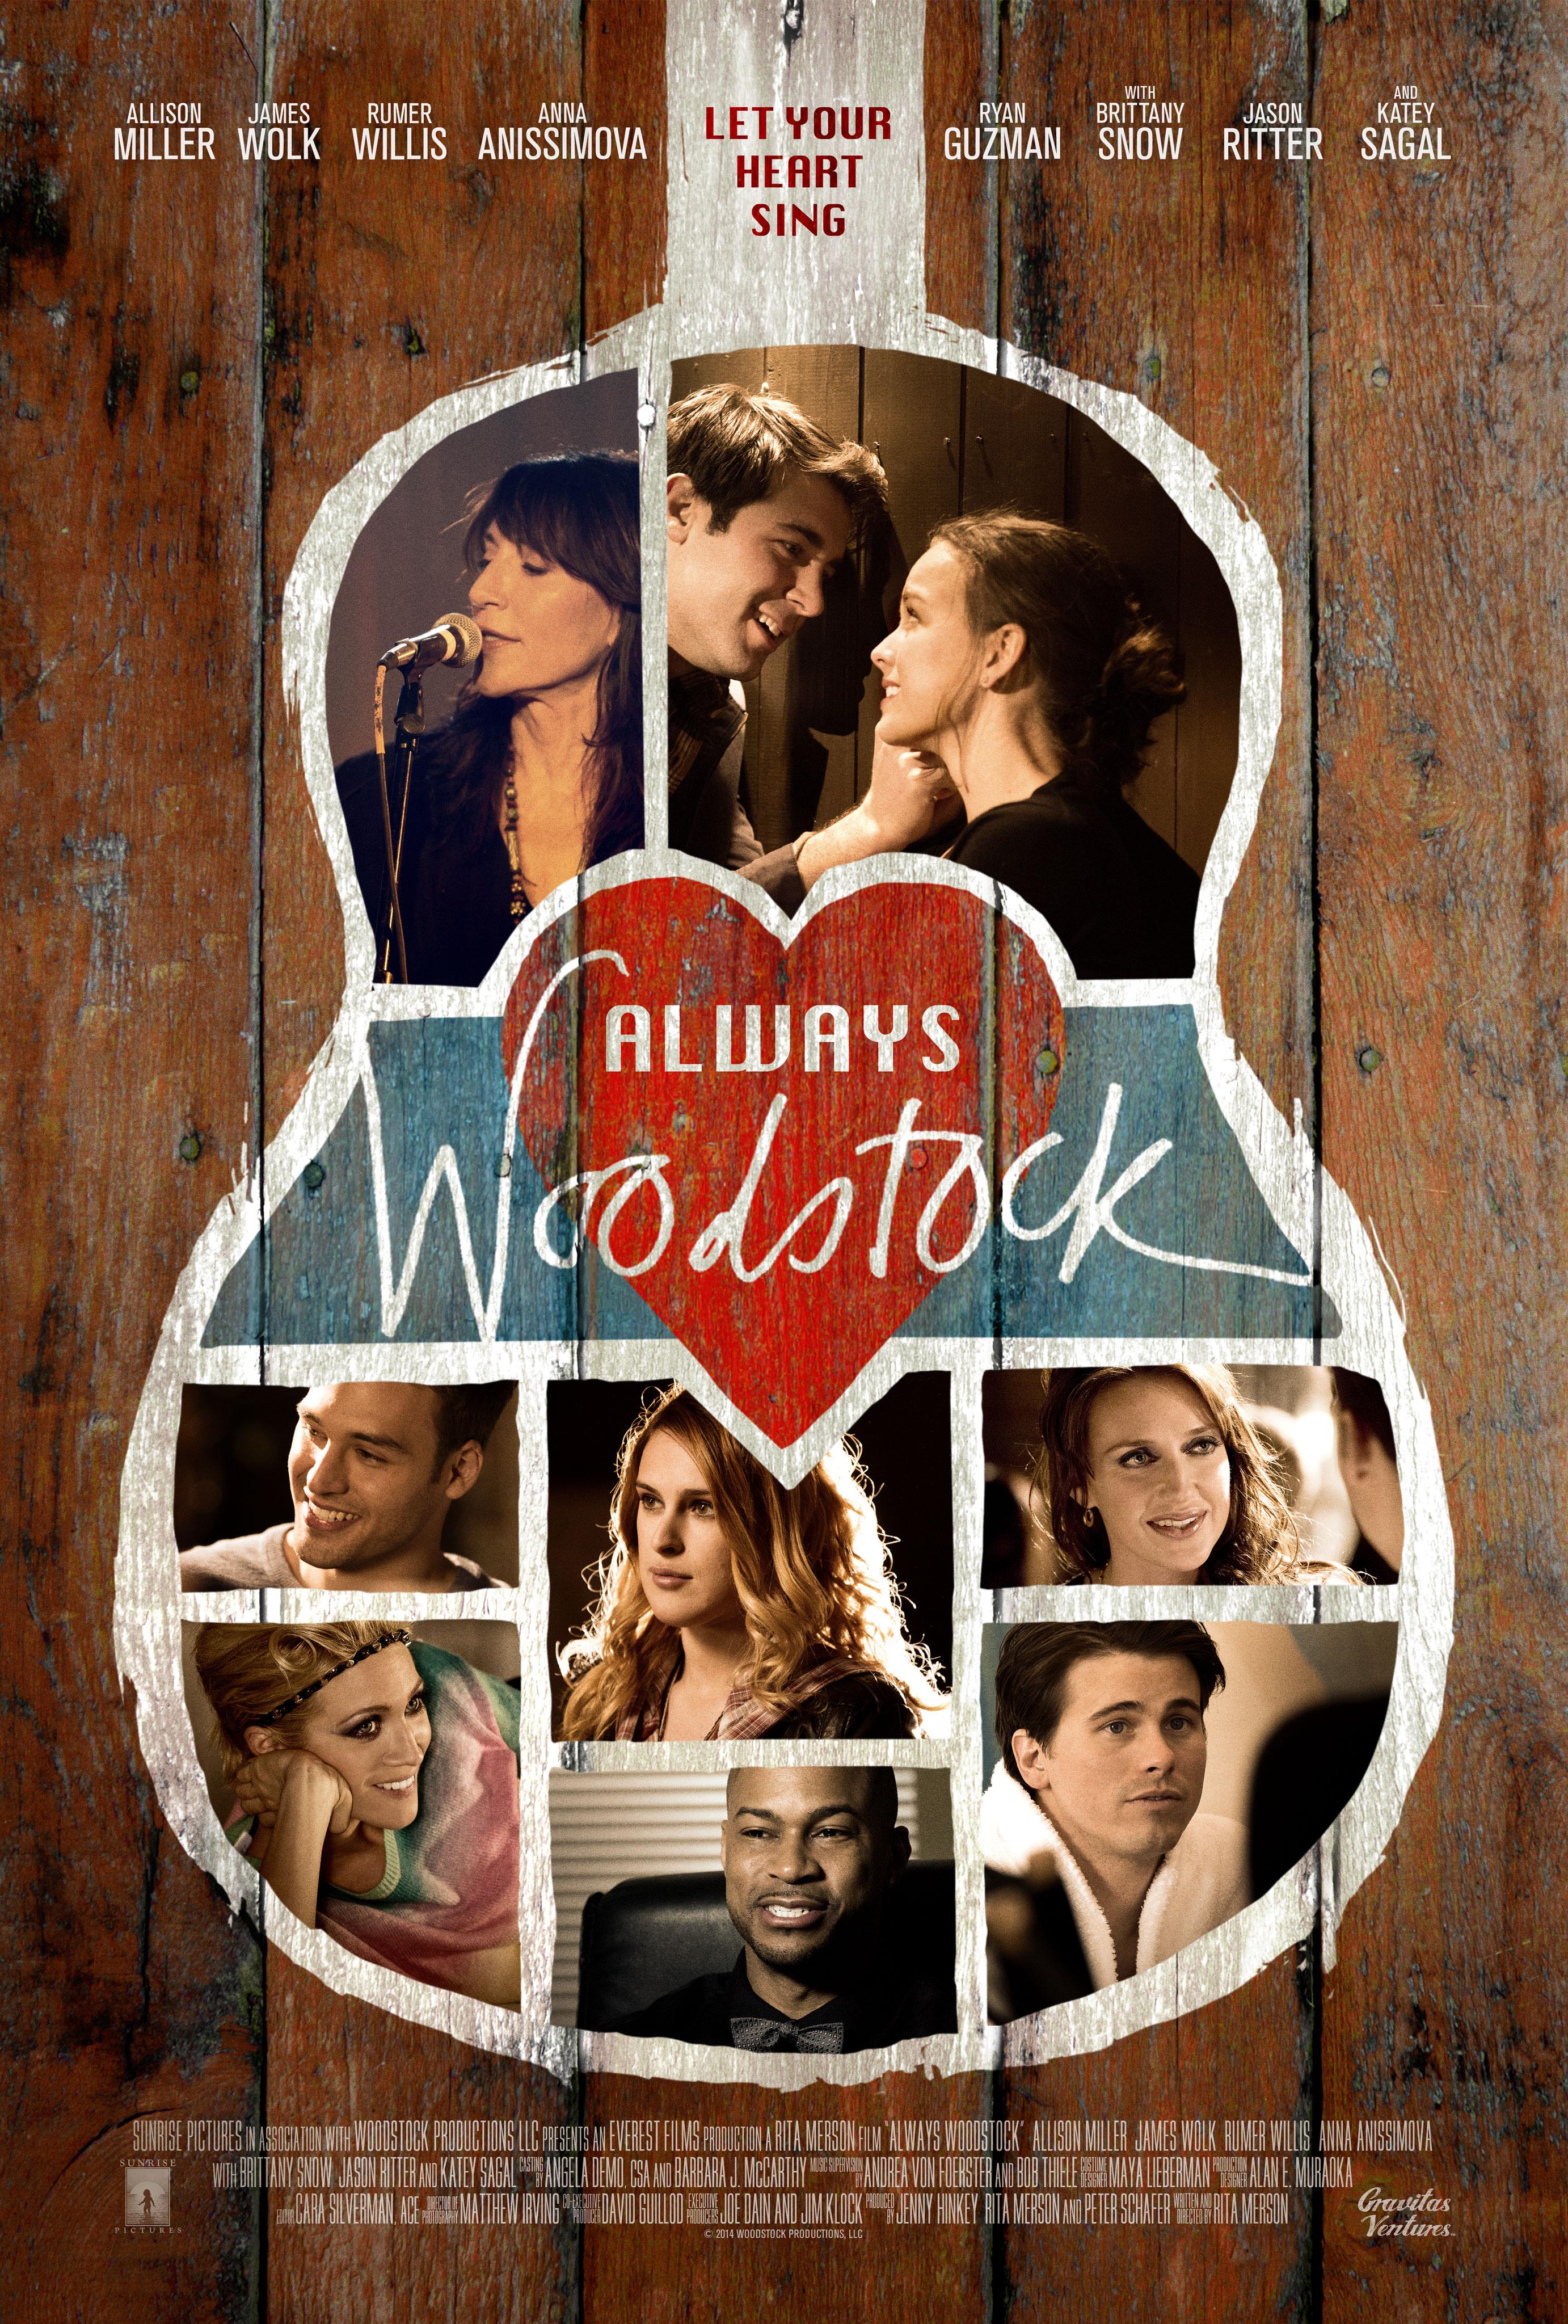 Katey Sagal, Jason Ritter, Brittany Snow, Rumer Willis, Allison Miller, James Wolk, Anna Anissimova and Ryan Guzman in There's Always Woodstock (2014)